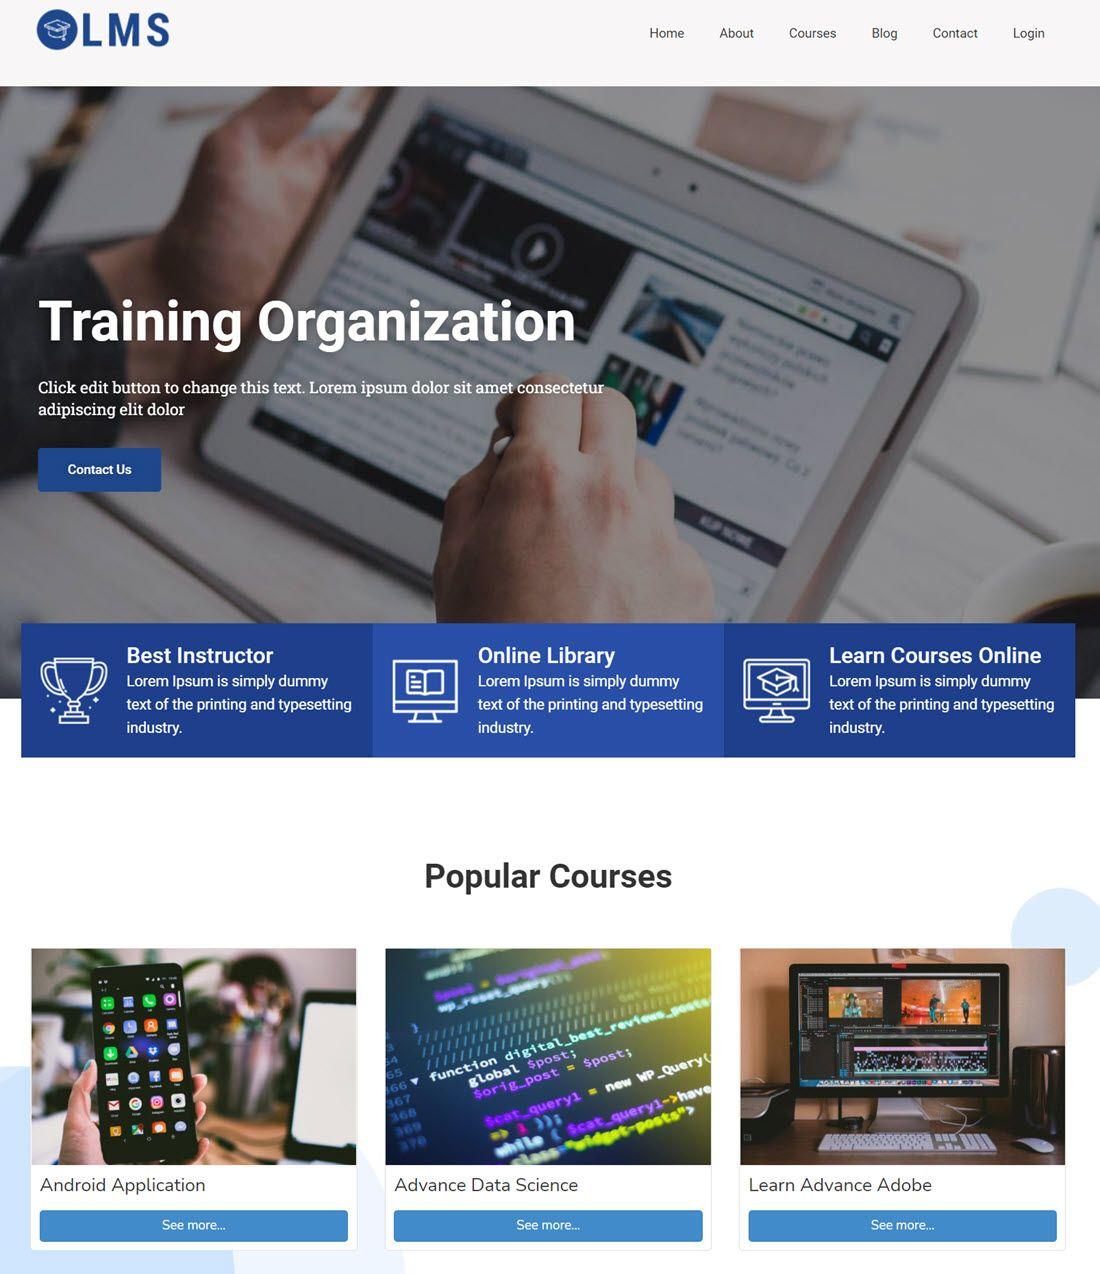 CyberChimps Training Organization LMS Theme